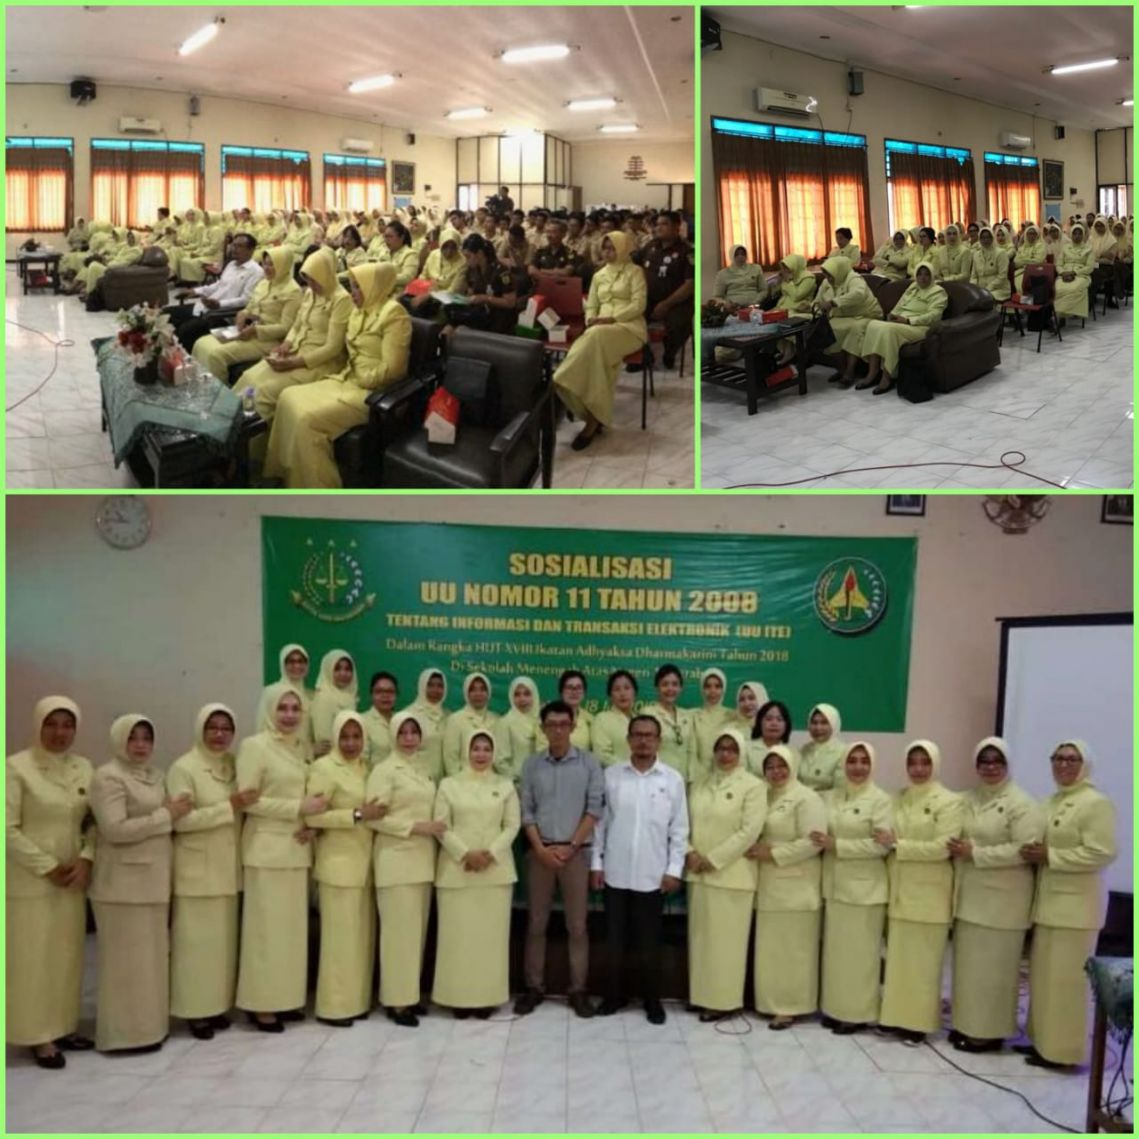 Sosialisasi UU I.T.E. di SMAN 15 Surabaya 18-07-2018